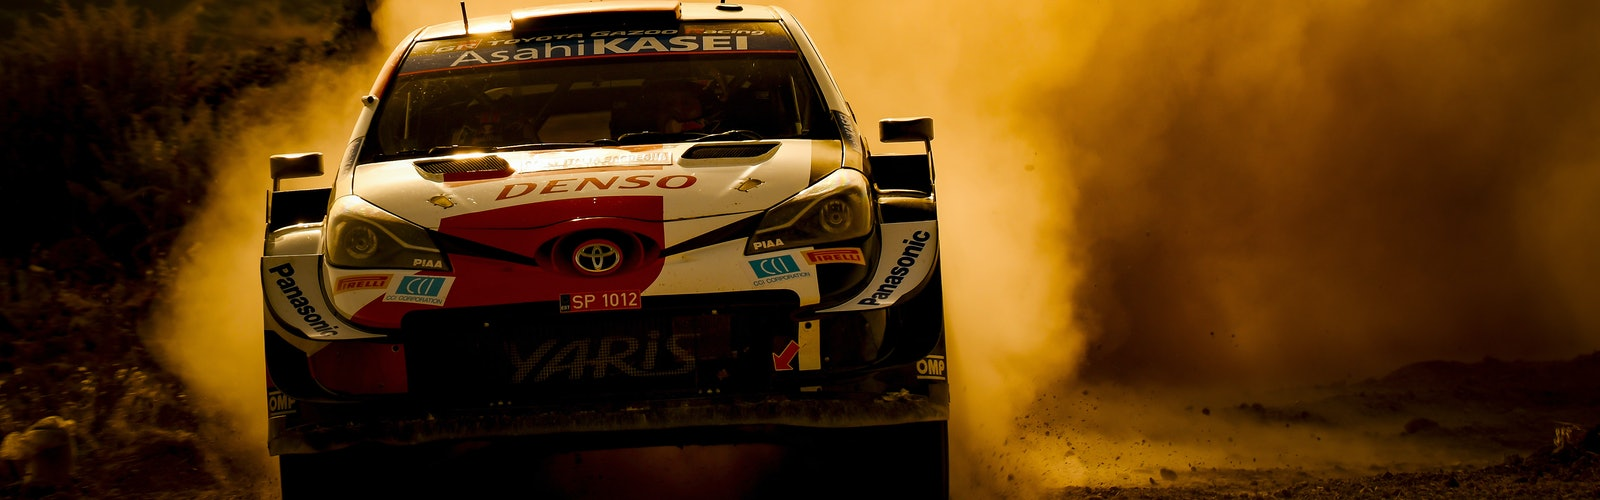 WRC_2021_Rd.5_259